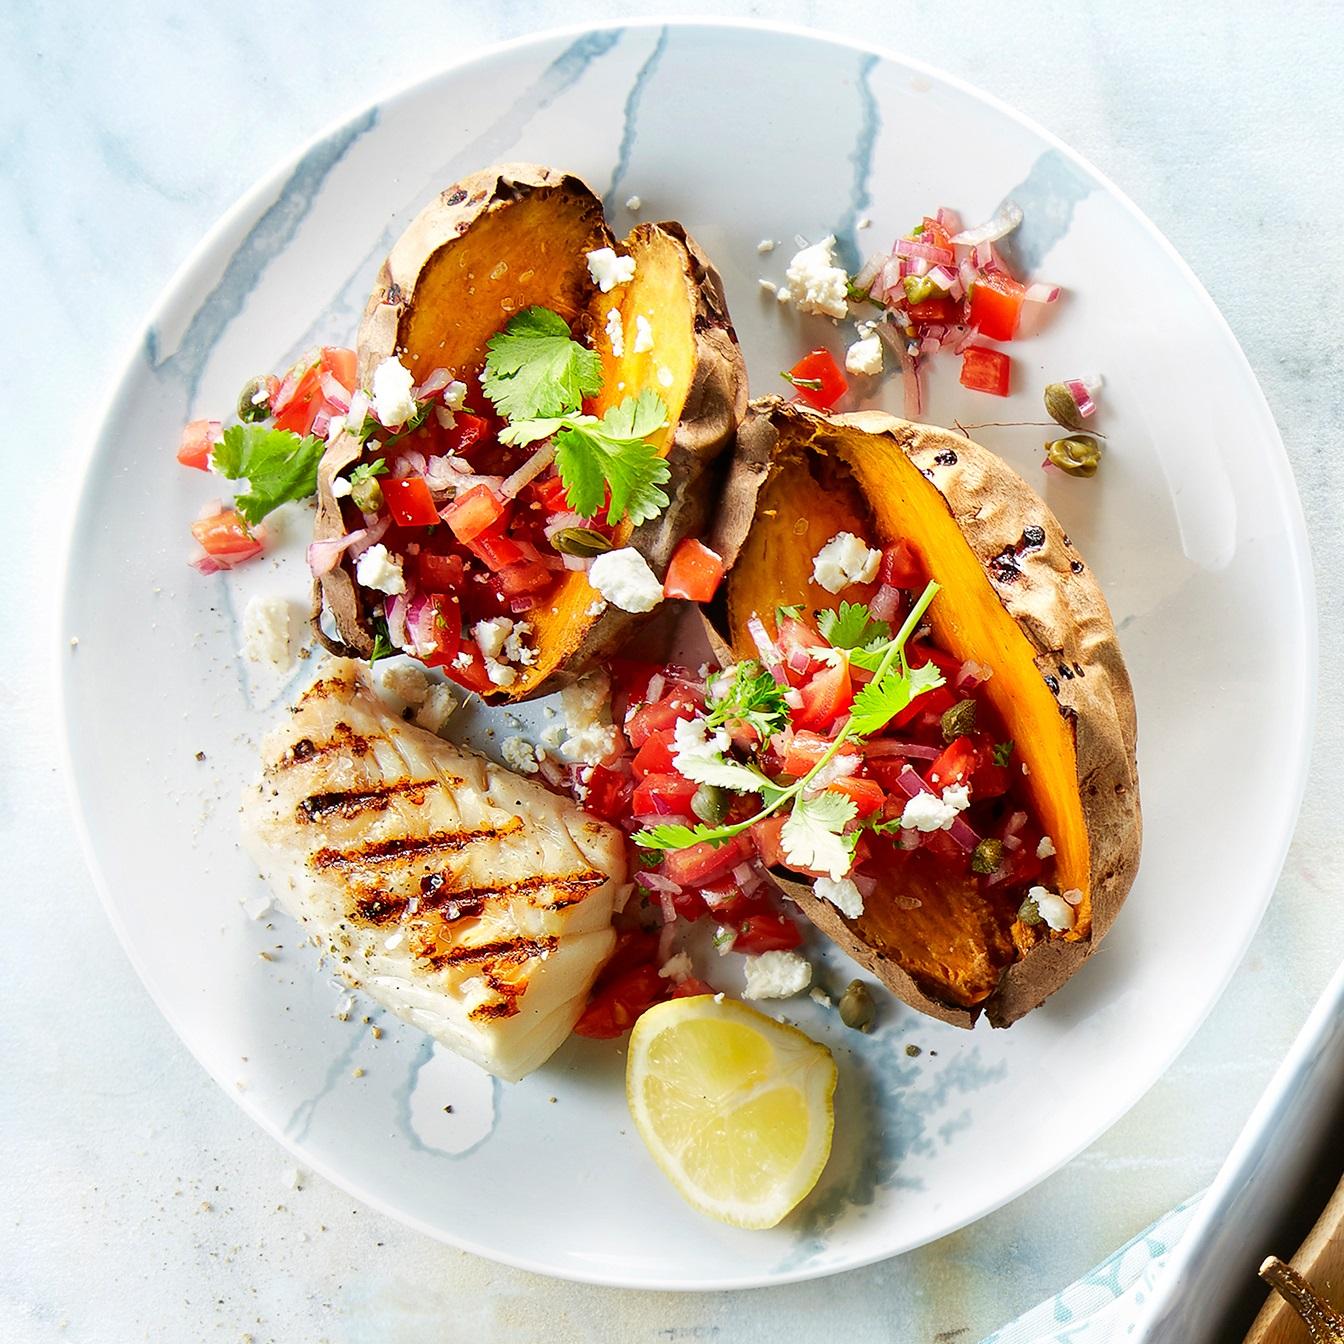 Gepofte zoete aardappel met tomatensalsa en feta